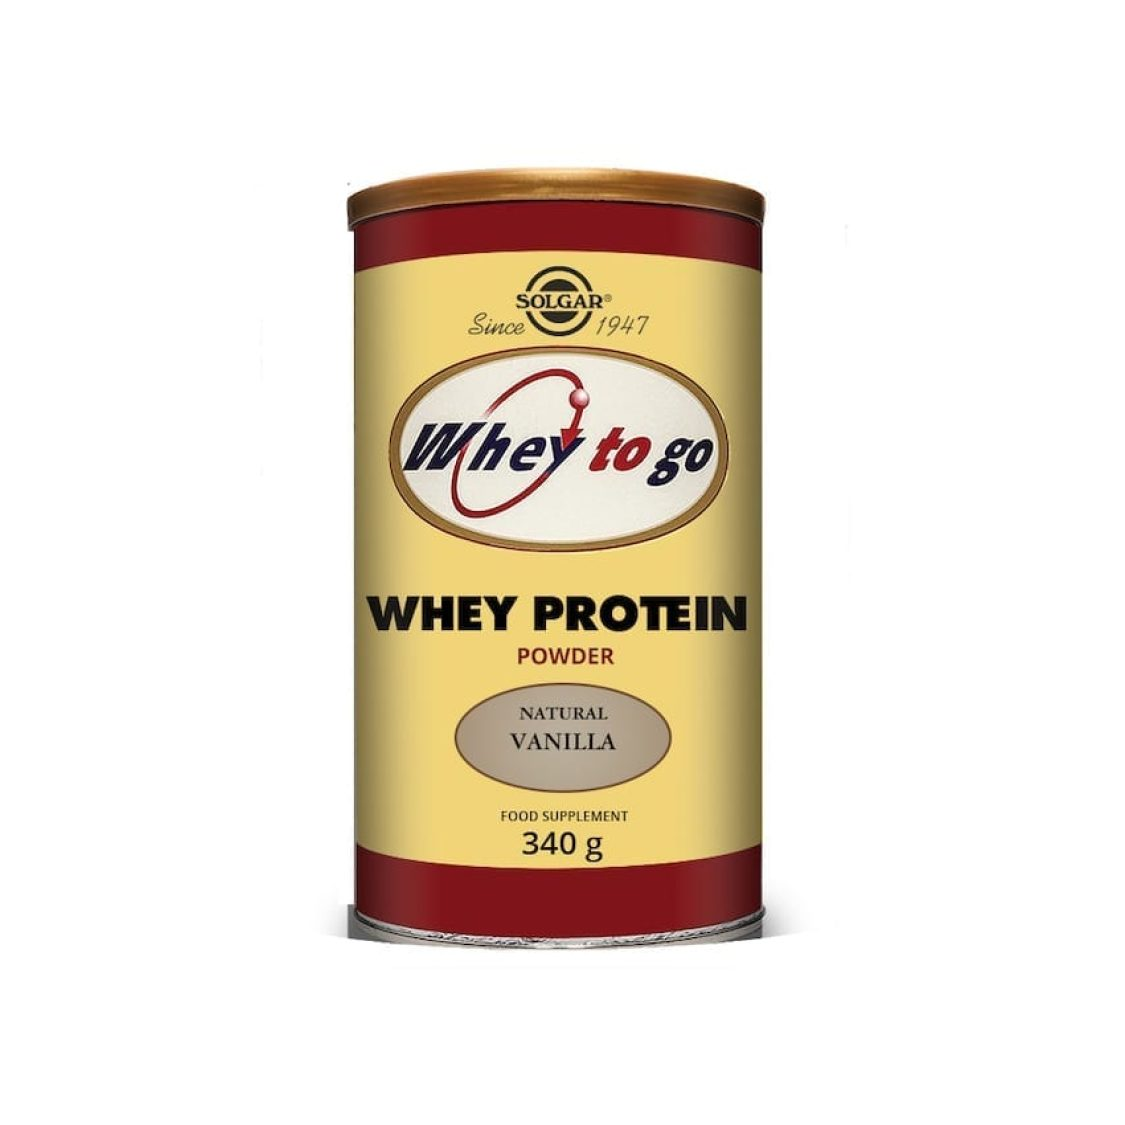 Solgar - Protein - Whey to Go Protein Powder (Choc) - Size: 454g